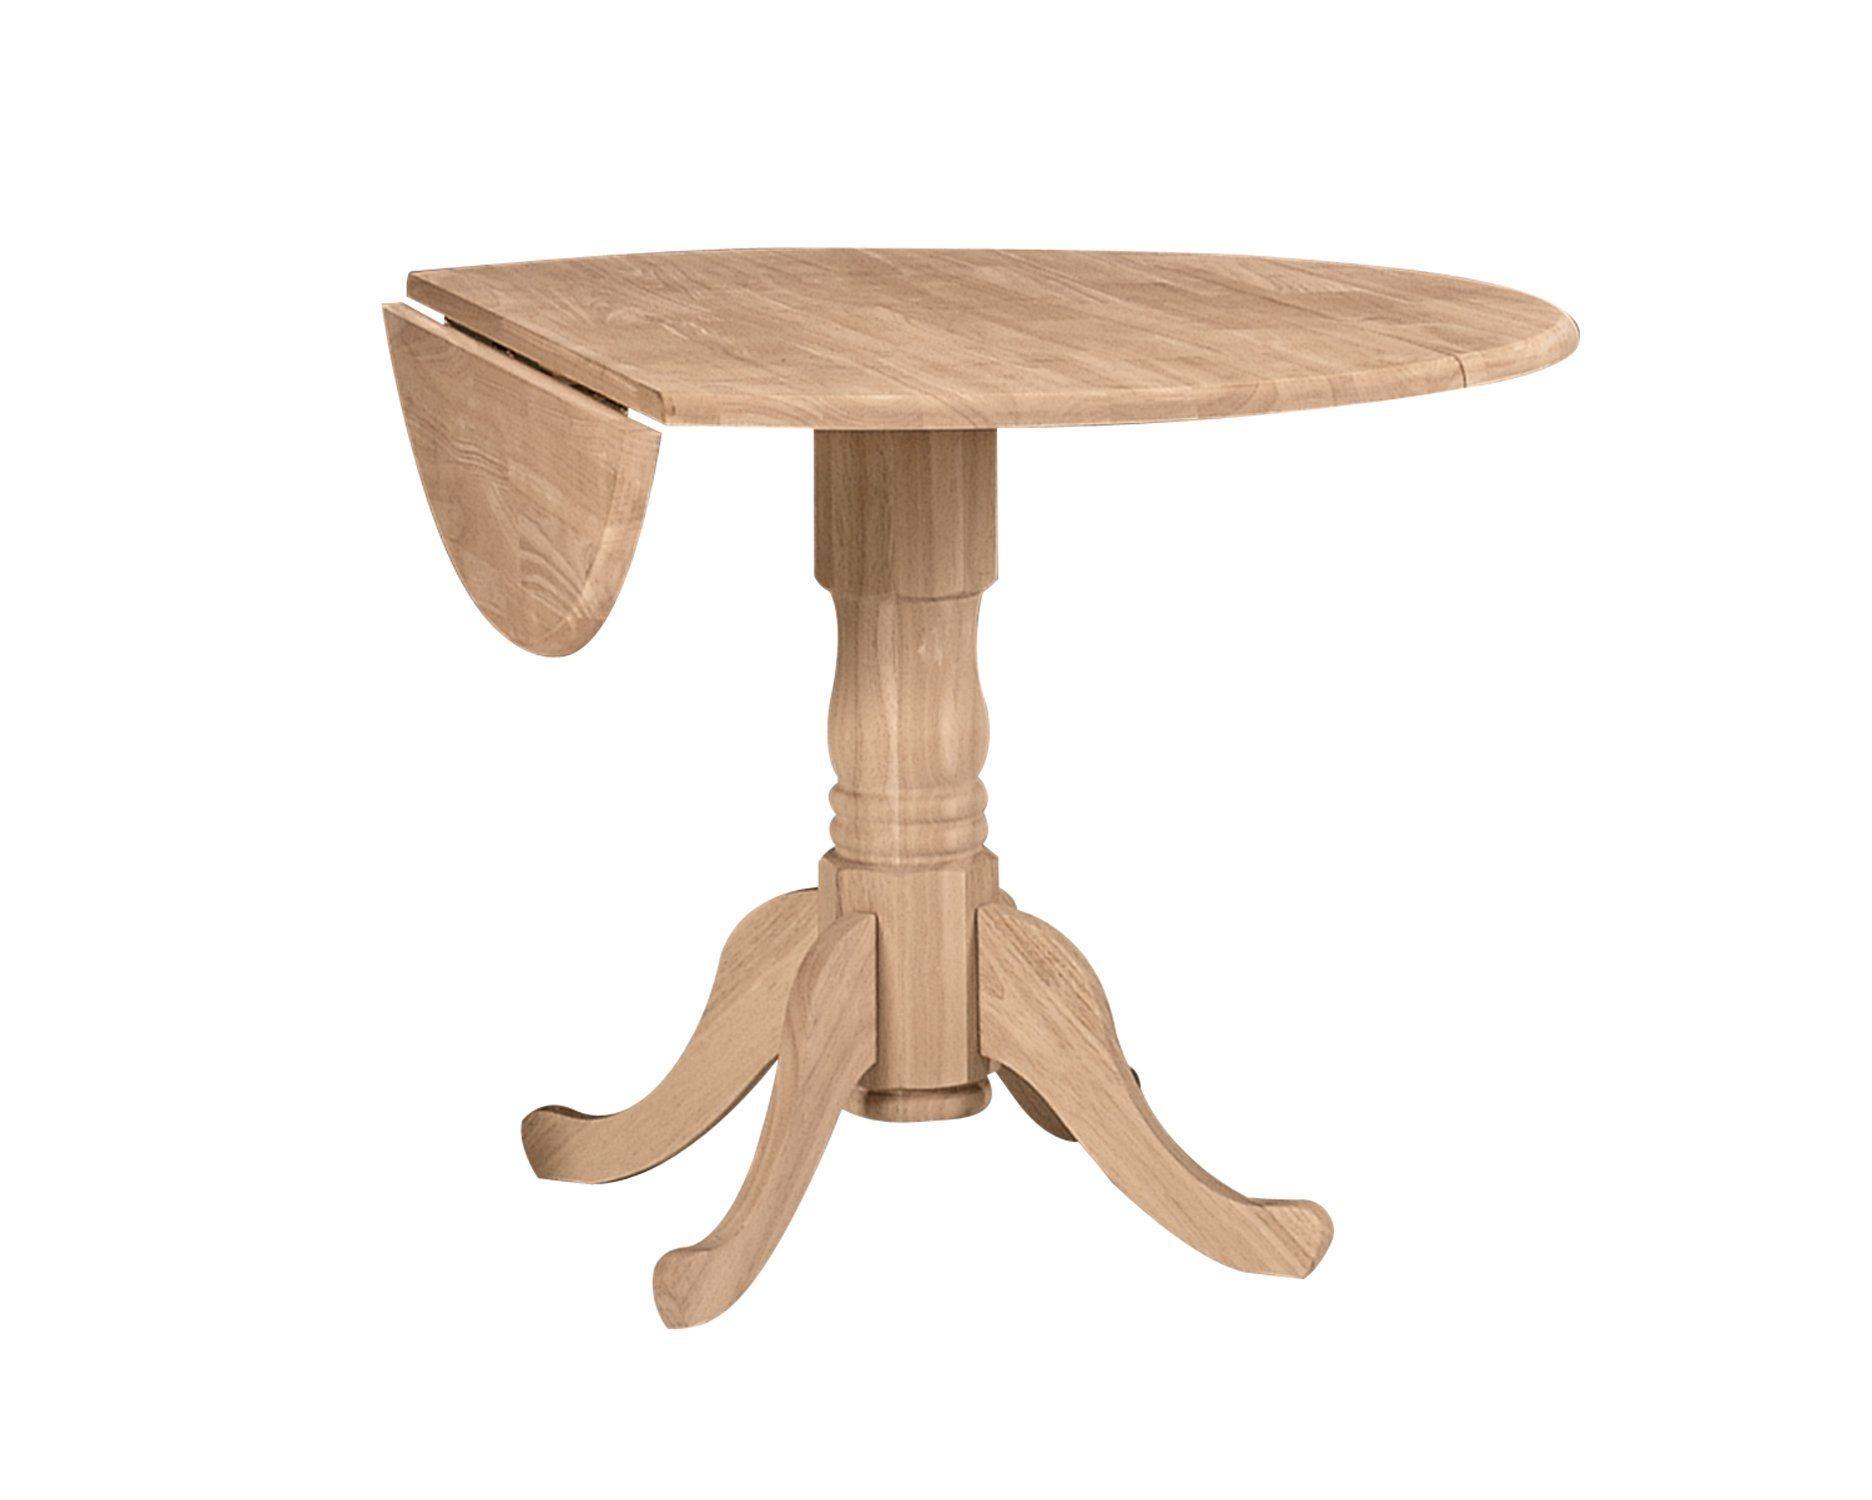 Ww T 42dp 42 Round Drop Leaf Pedestal Table Dining Table Drop Leaf Table Dining Table In Kitchen